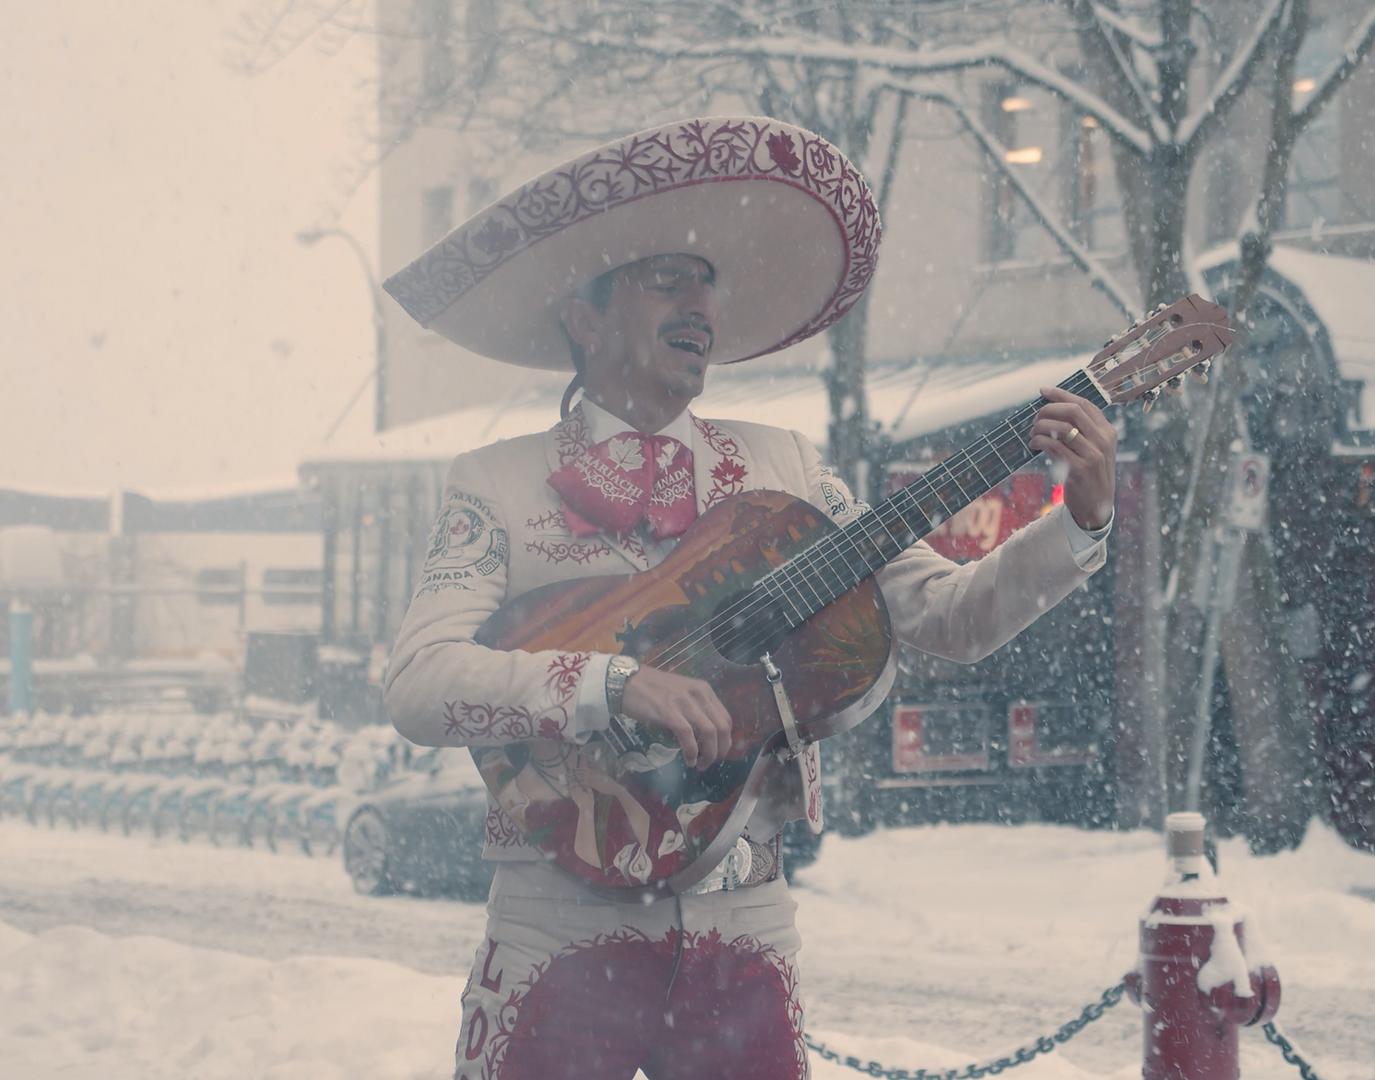 Mariachi in the Snow